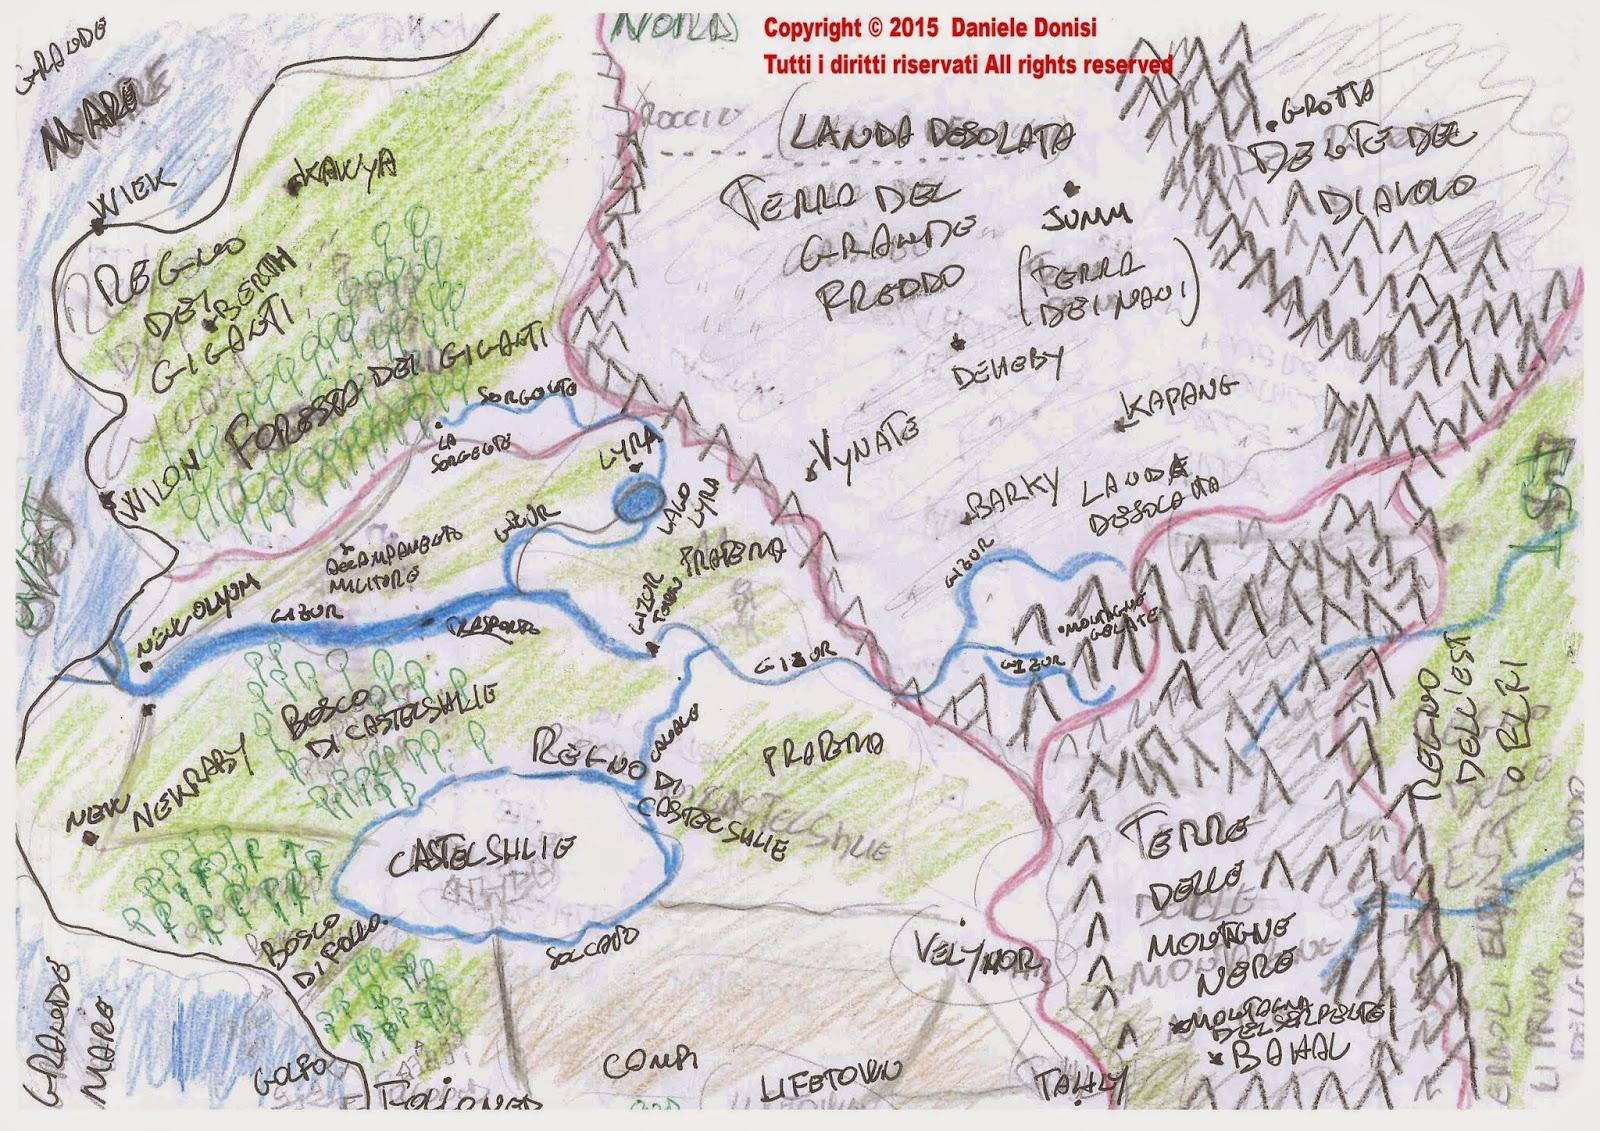 Mappa Bracbah Daniele Donisi